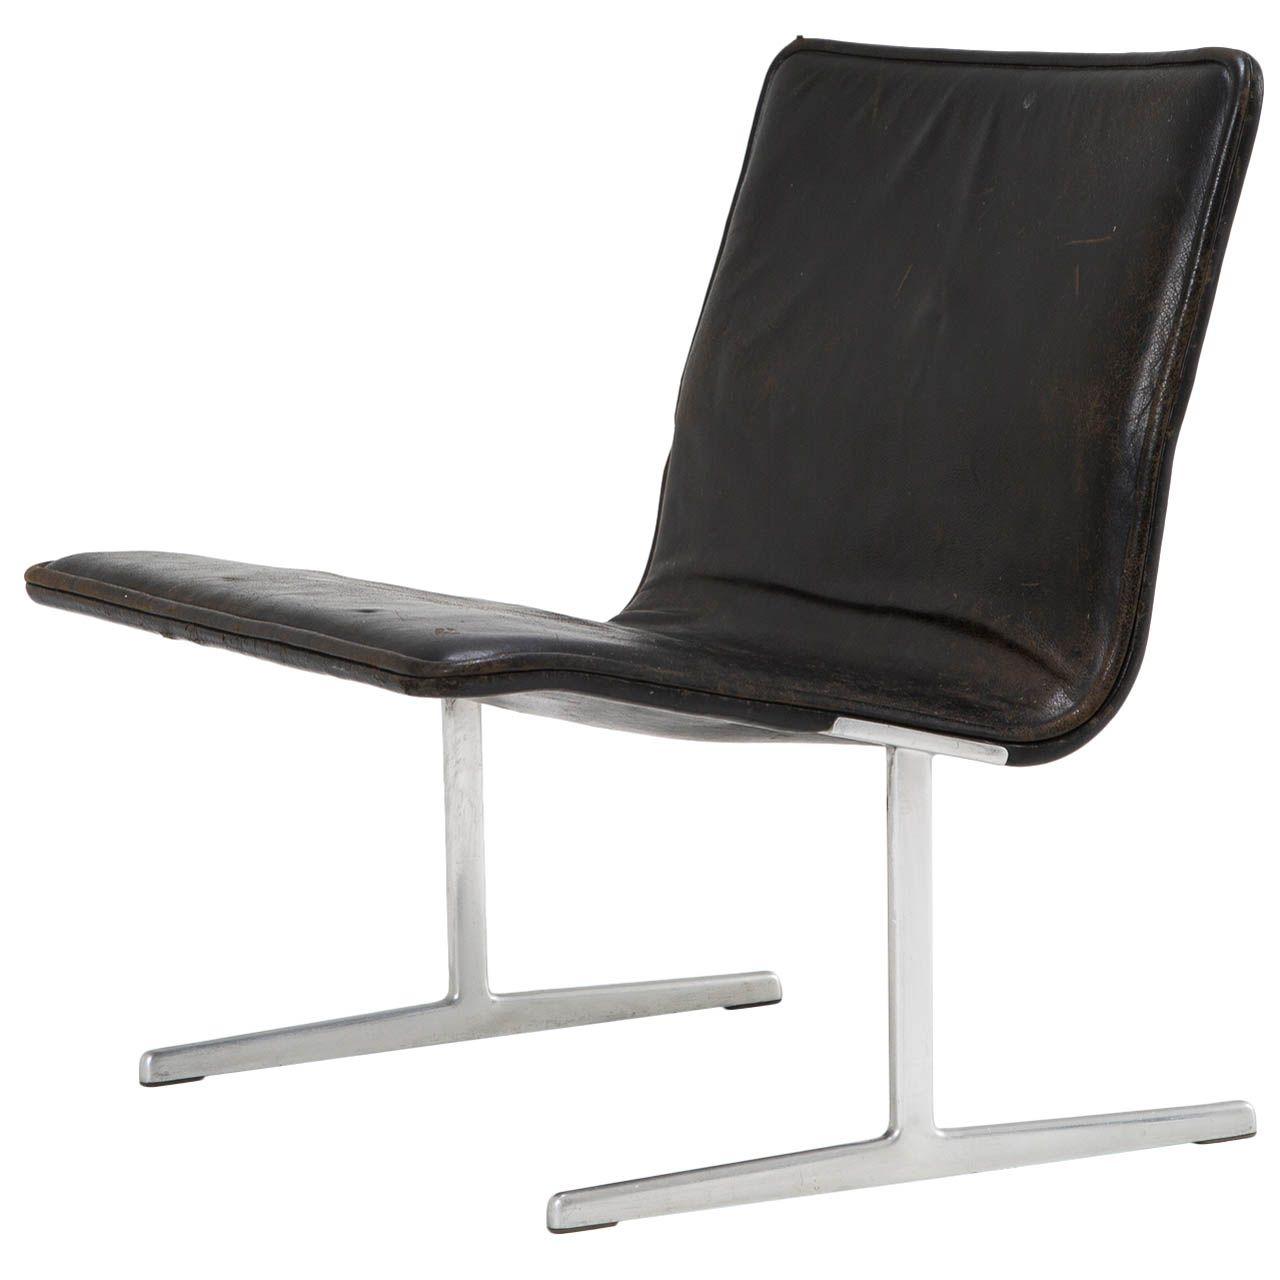 Outstanding 602 Easy Chair By Dieter Rams In Original Black Leather Inzonedesignstudio Interior Chair Design Inzonedesignstudiocom